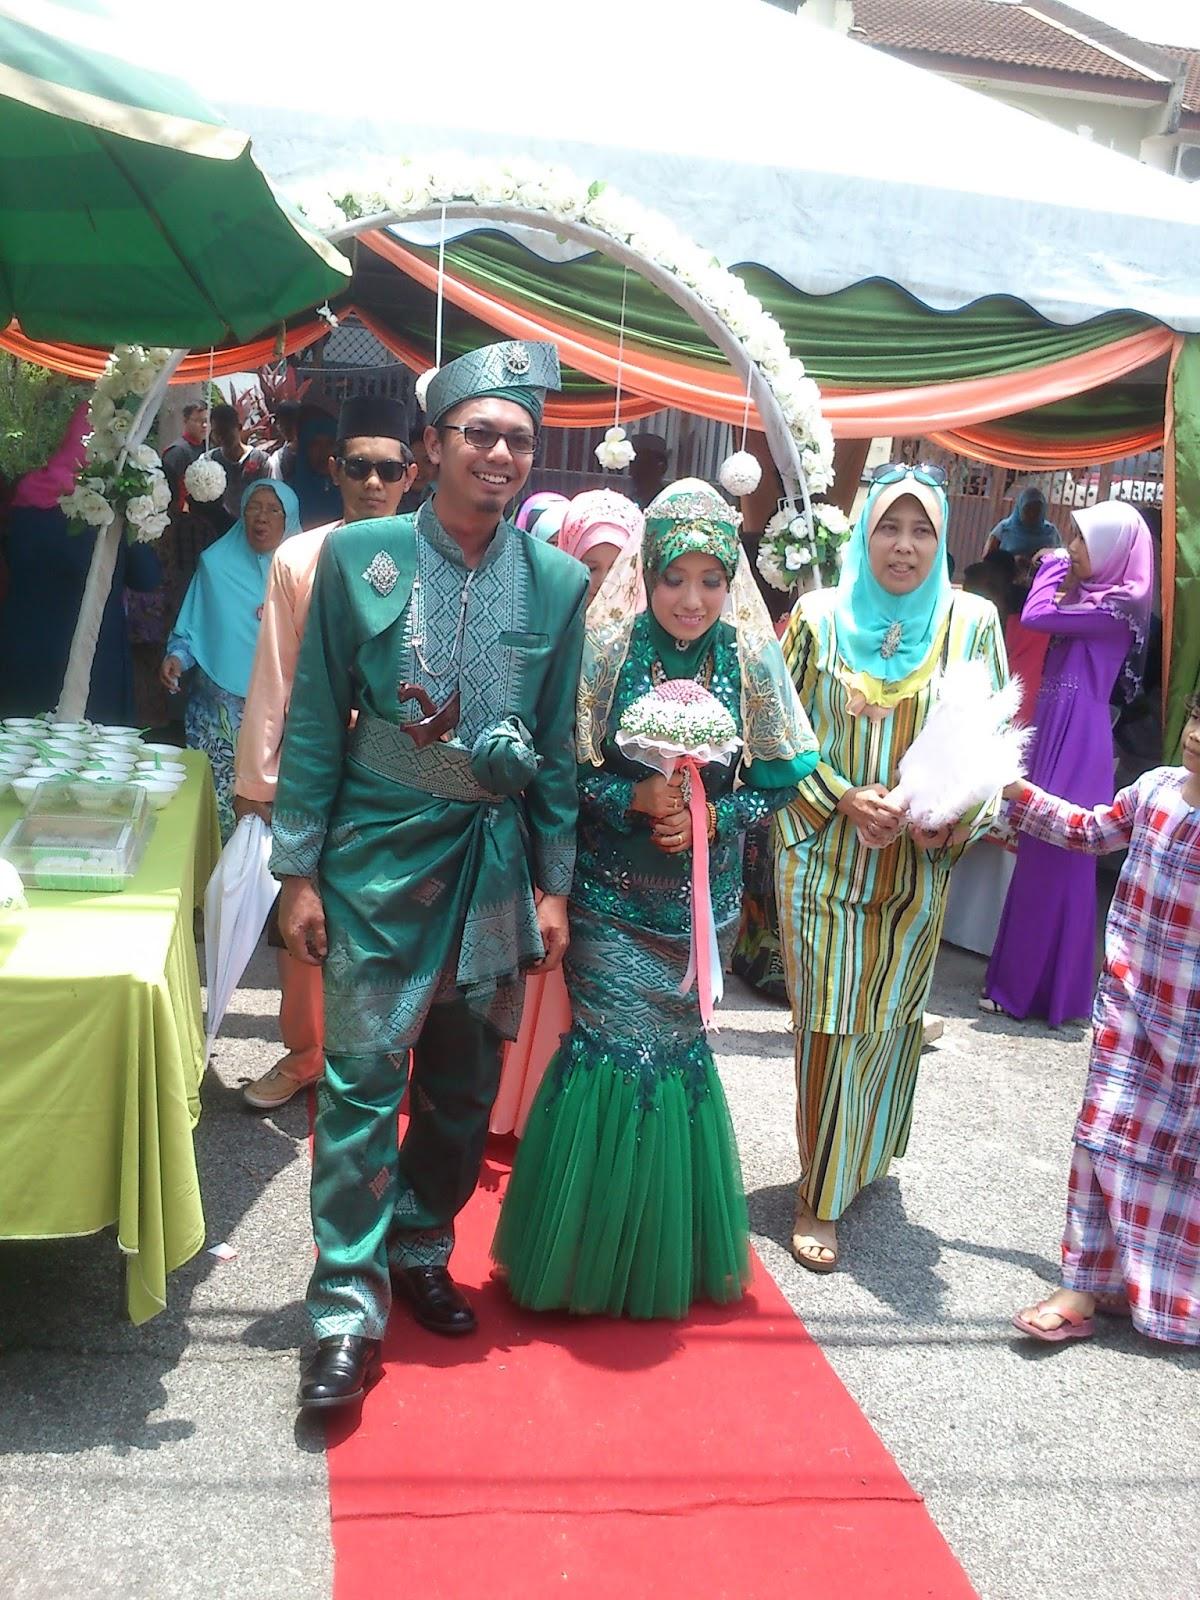 kuala kangsar gay singles Kuala kangsar kuala kangsar tourism  (build without a single metal nail and as per picture)  ask jo-annkytan about kuala kangsar royal district.